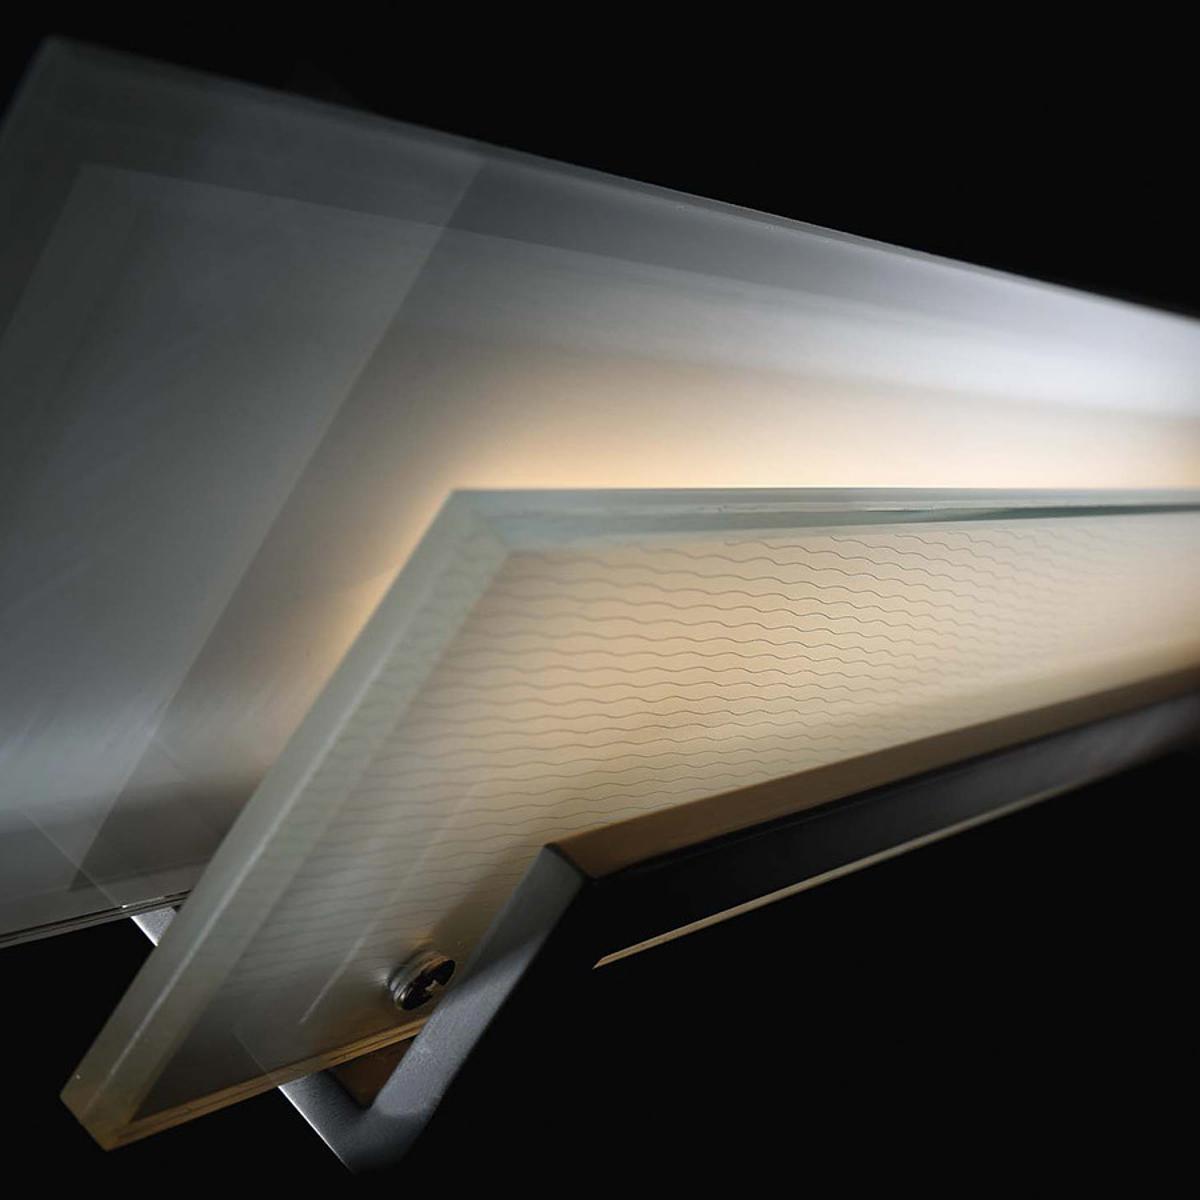 Modern Forms WS-70538-SN Margin Bathroom Vanity Light ...